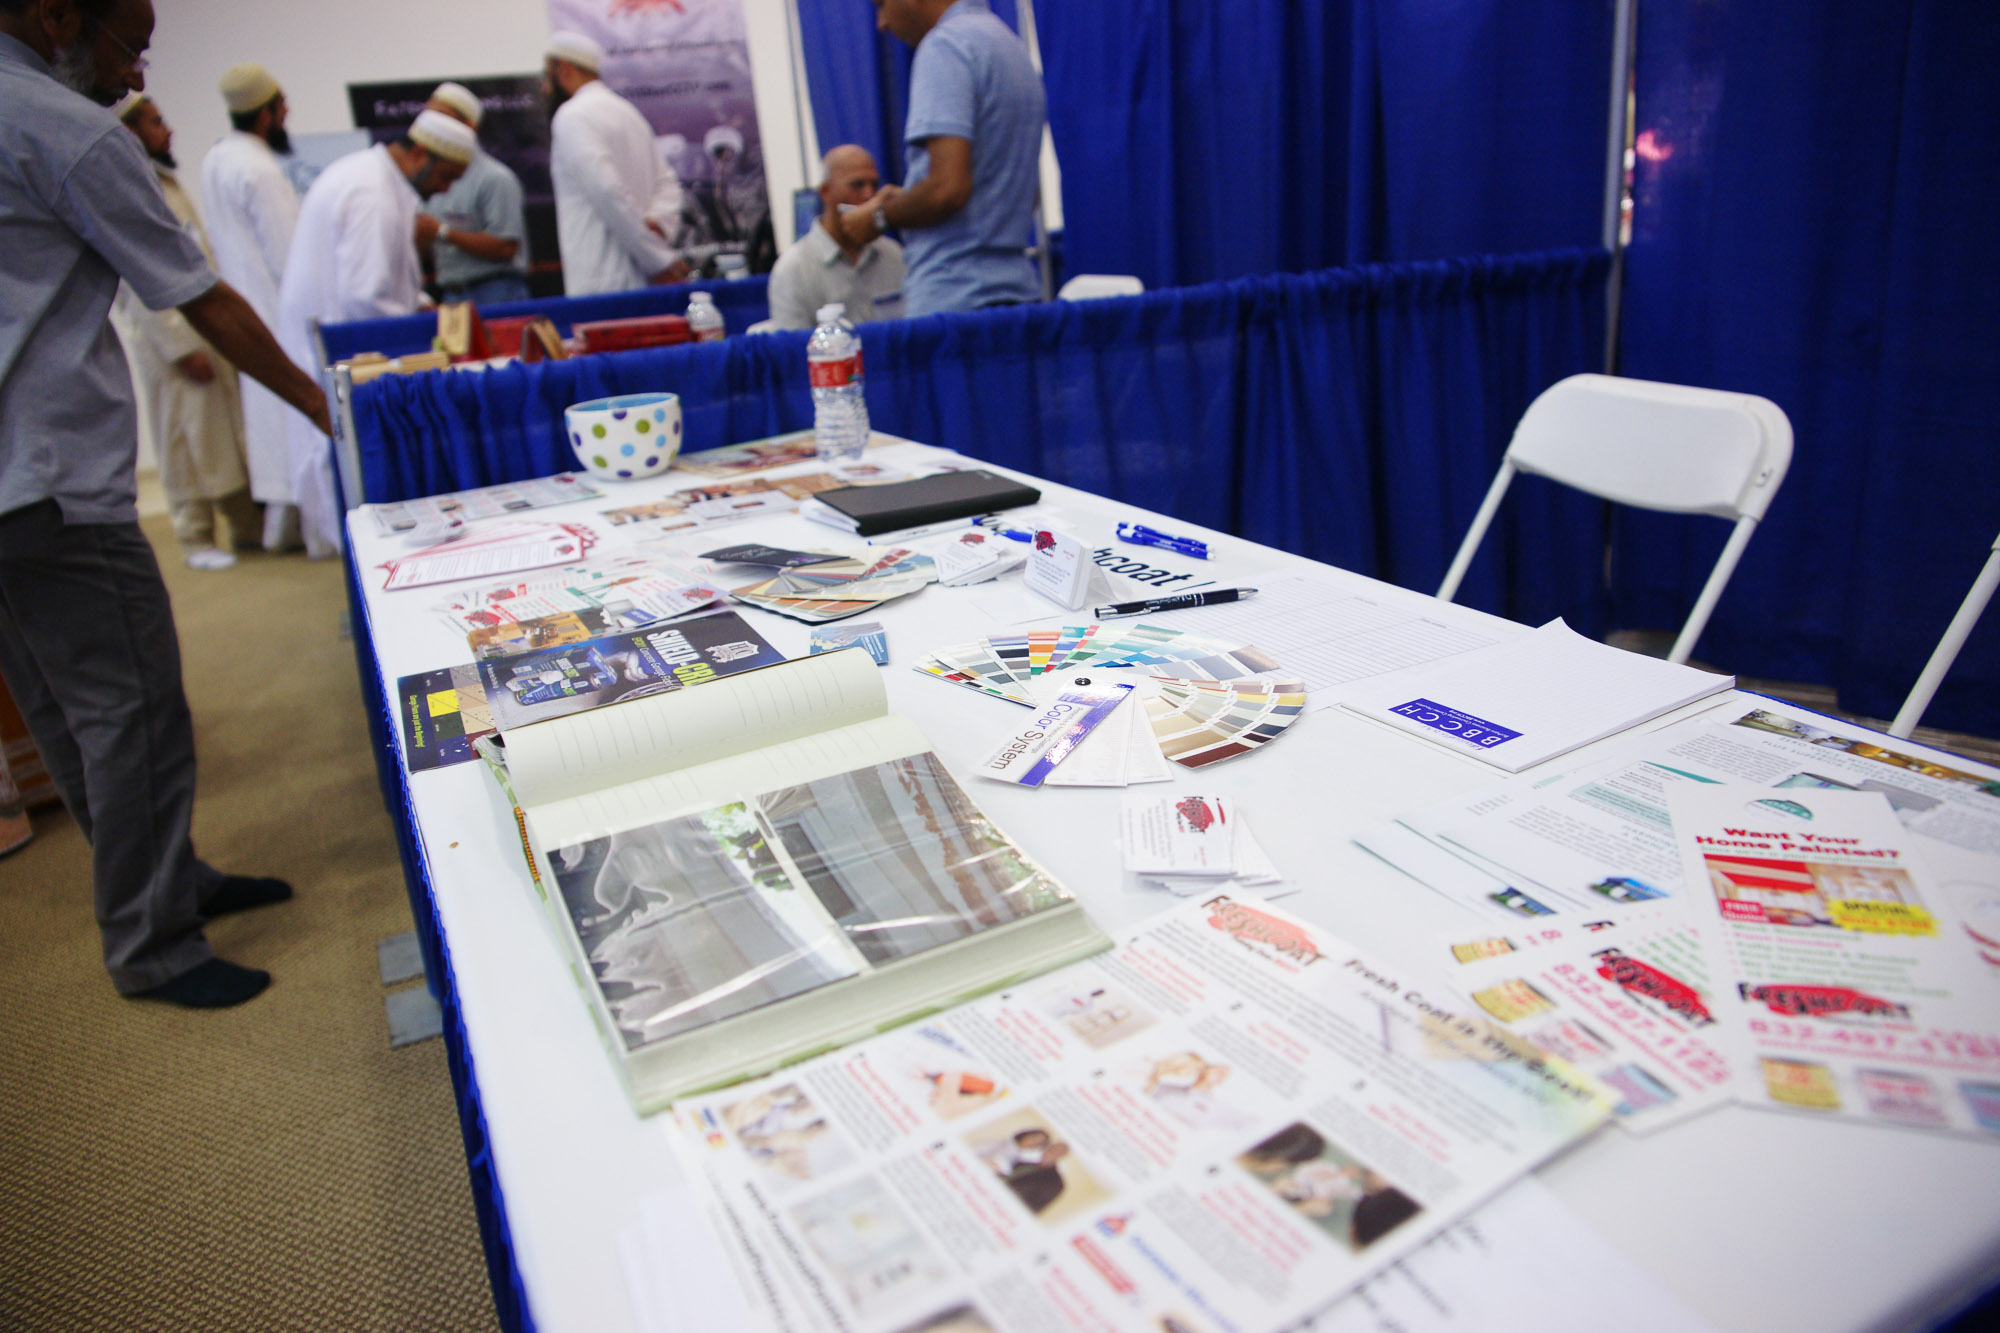 BBCC Houston Business Expo 2011album-16975646-downloads-pt4-5.JPG